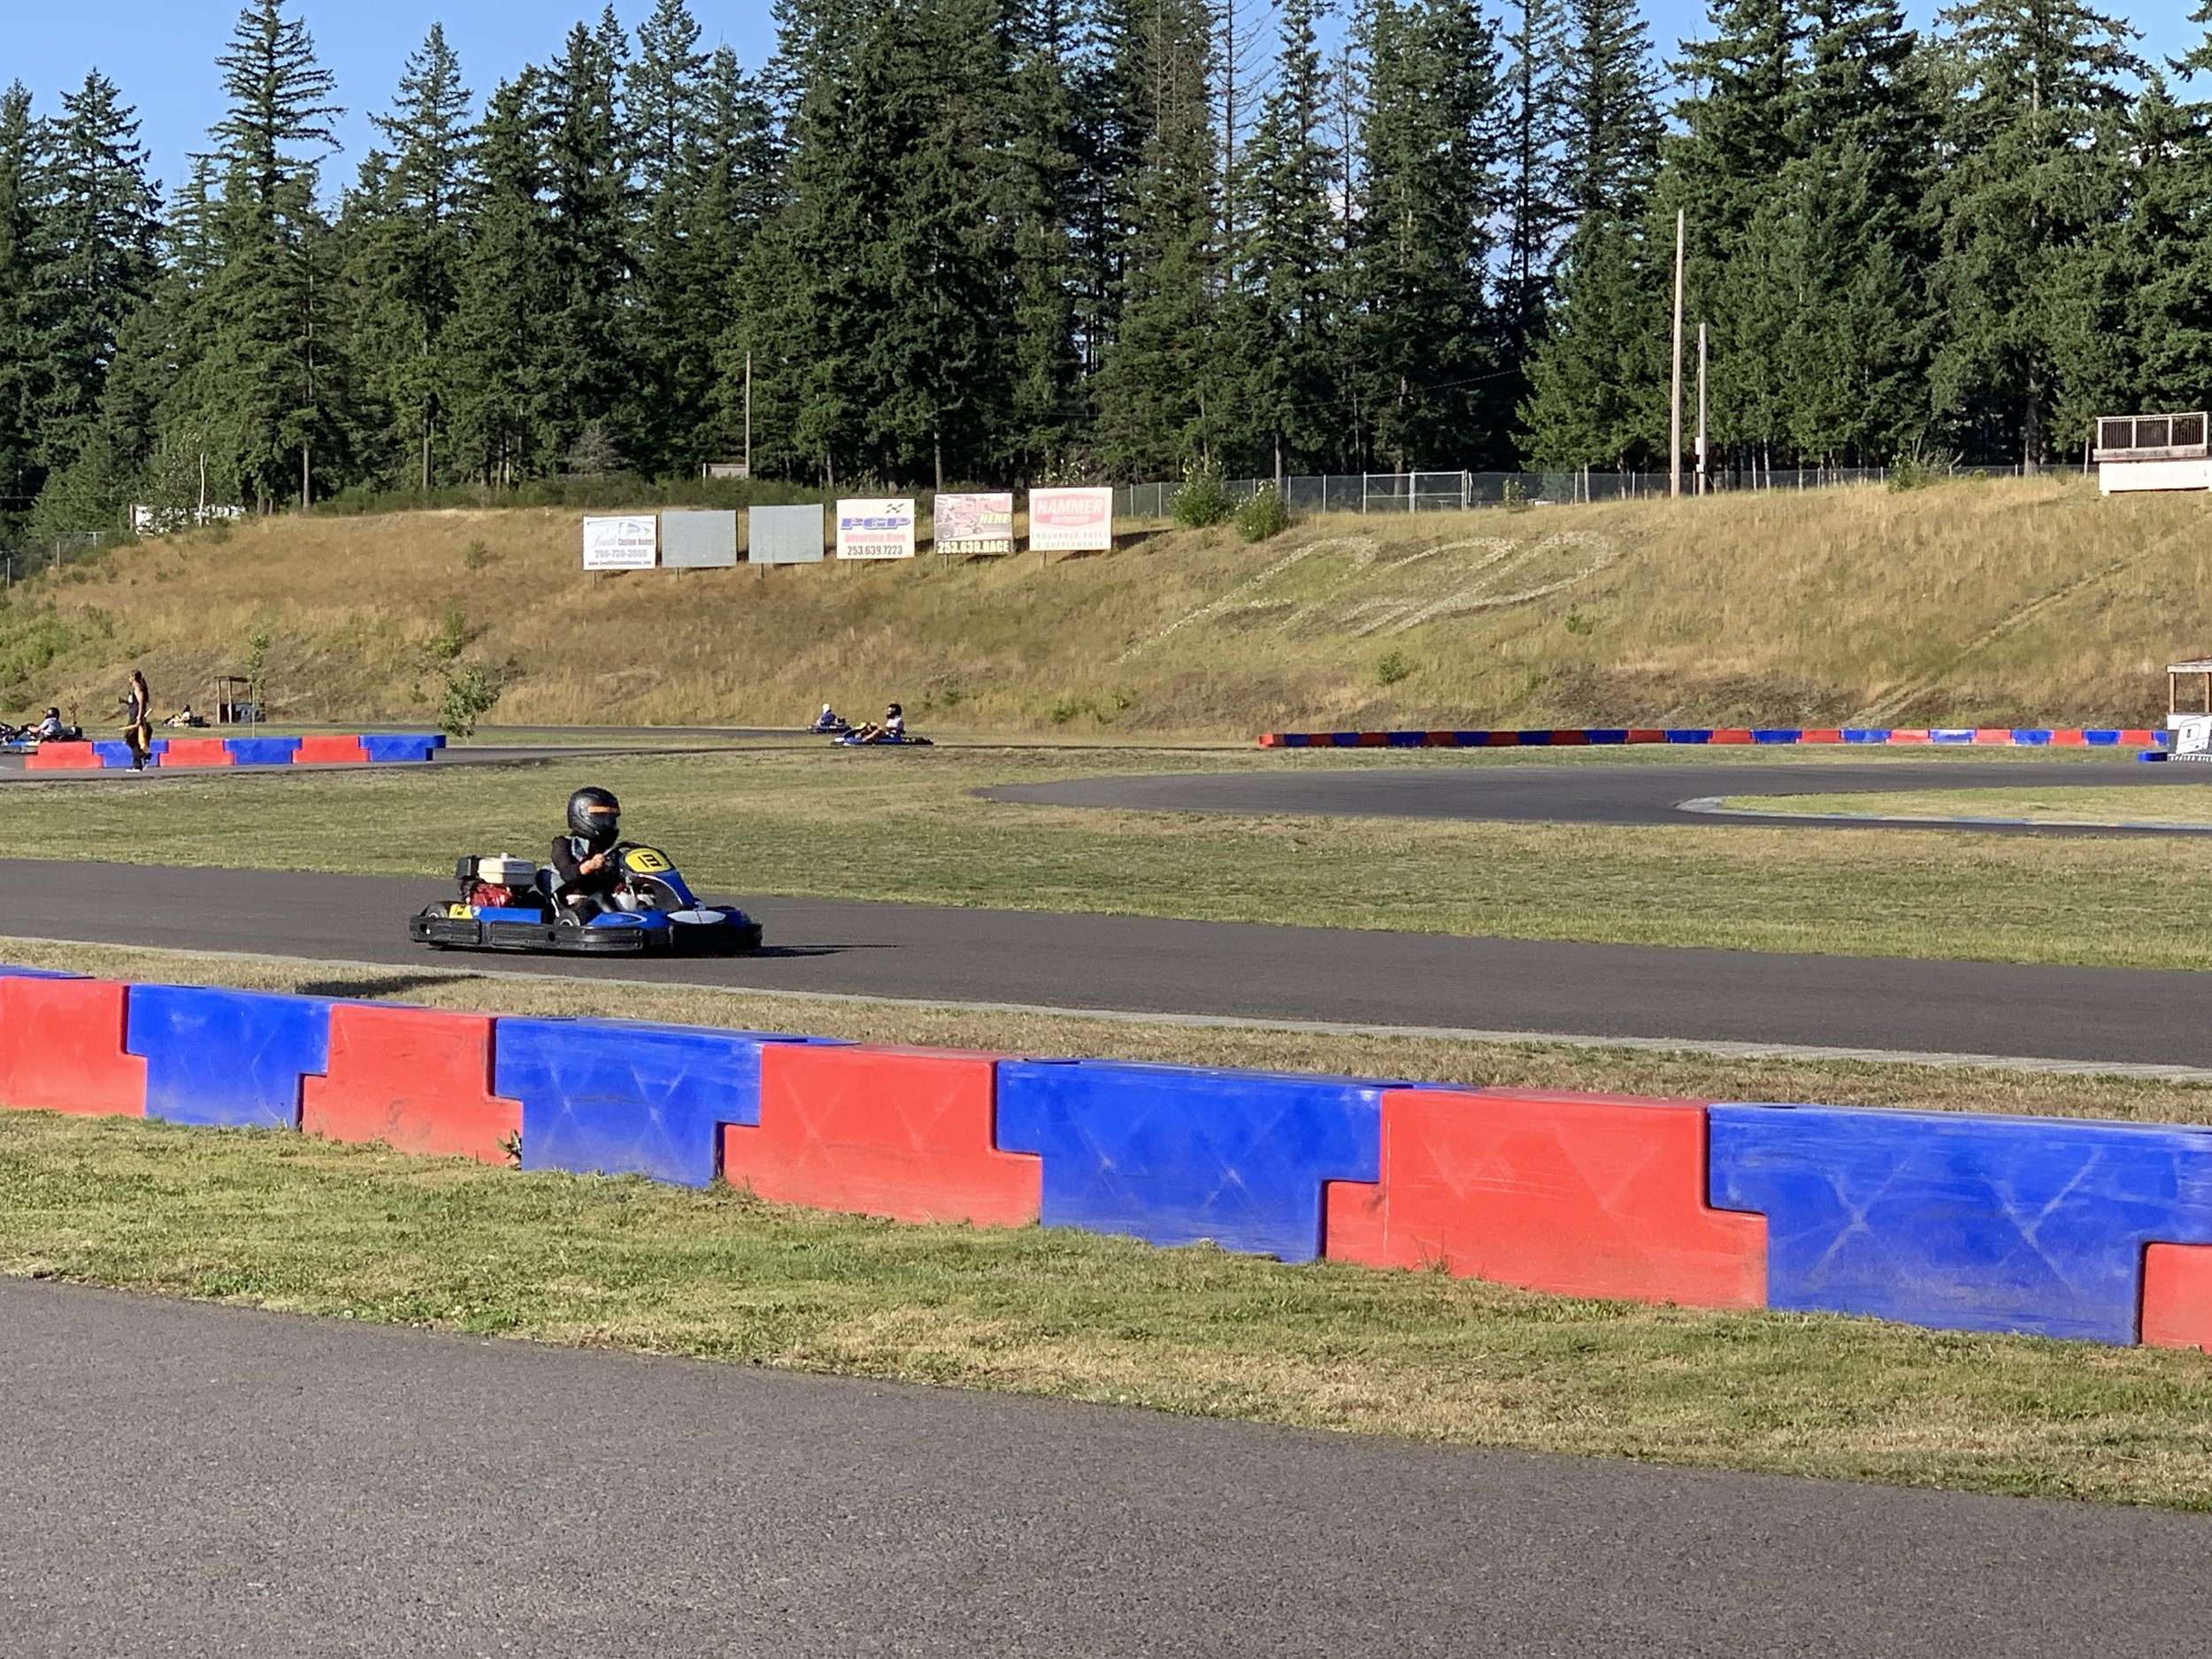 Danielle Racing